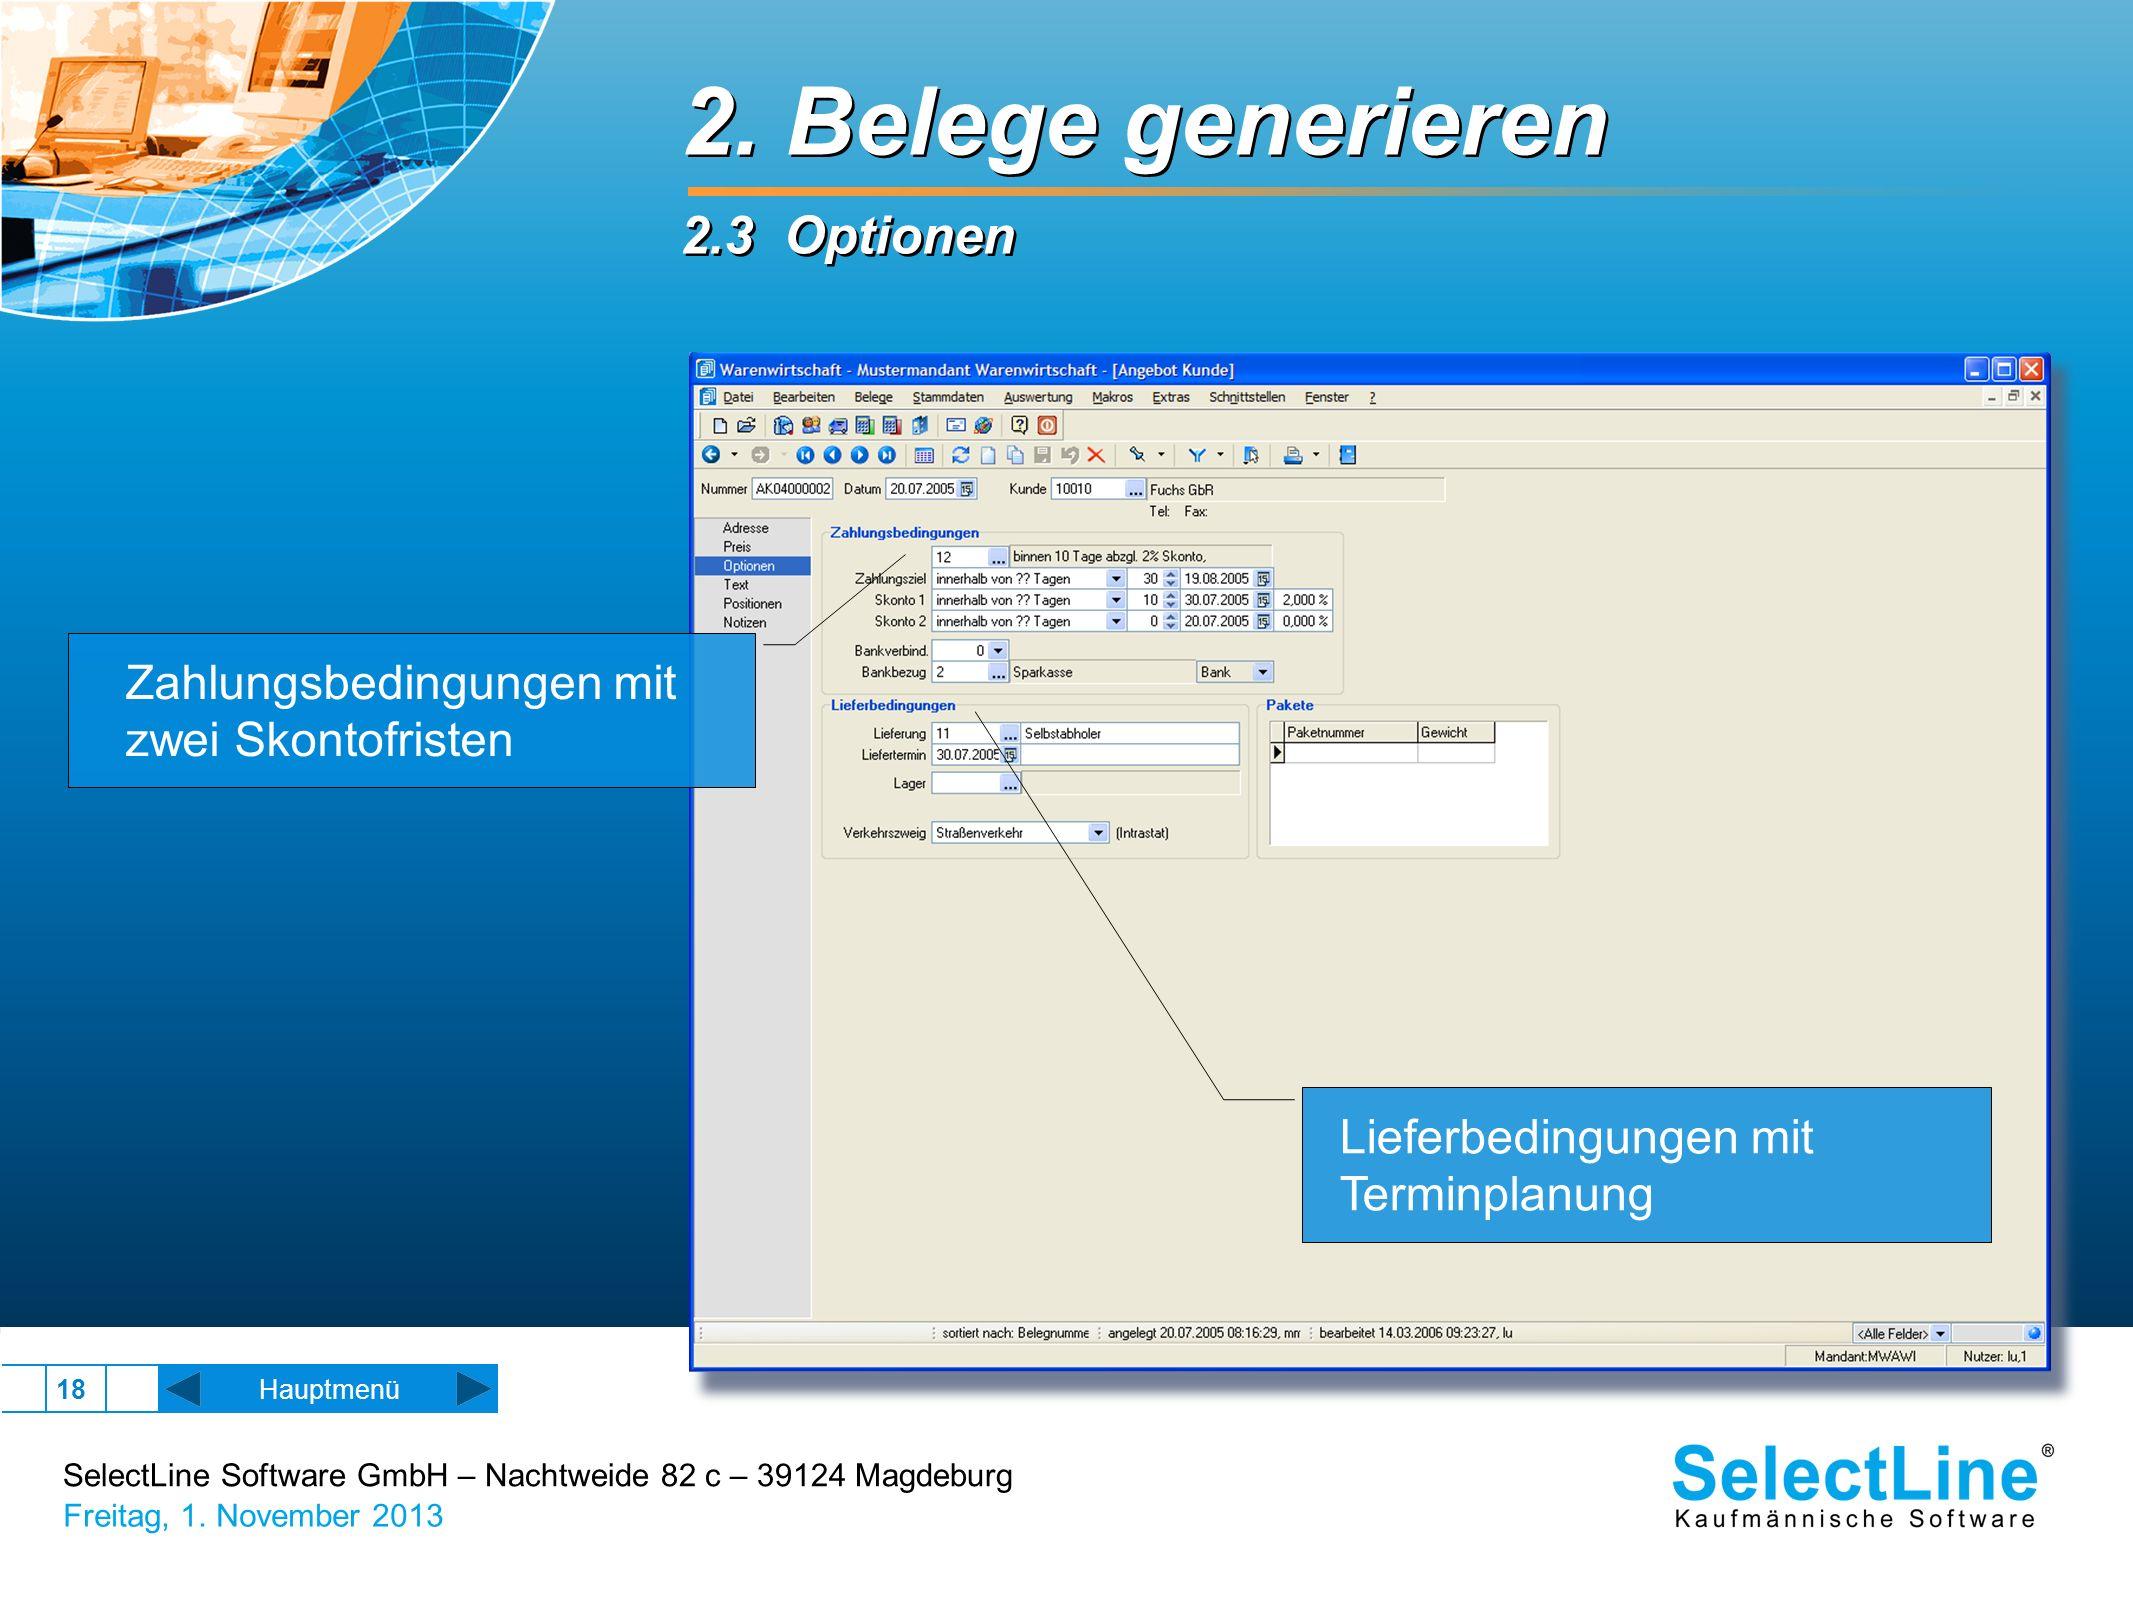 SelectLine Software GmbH – Nachtweide 82 c – 39124 Magdeburg Freitag, 1. November 2013 18 2. Belege generieren 2.3 Optionen 2. Belege generieren 2.3 O